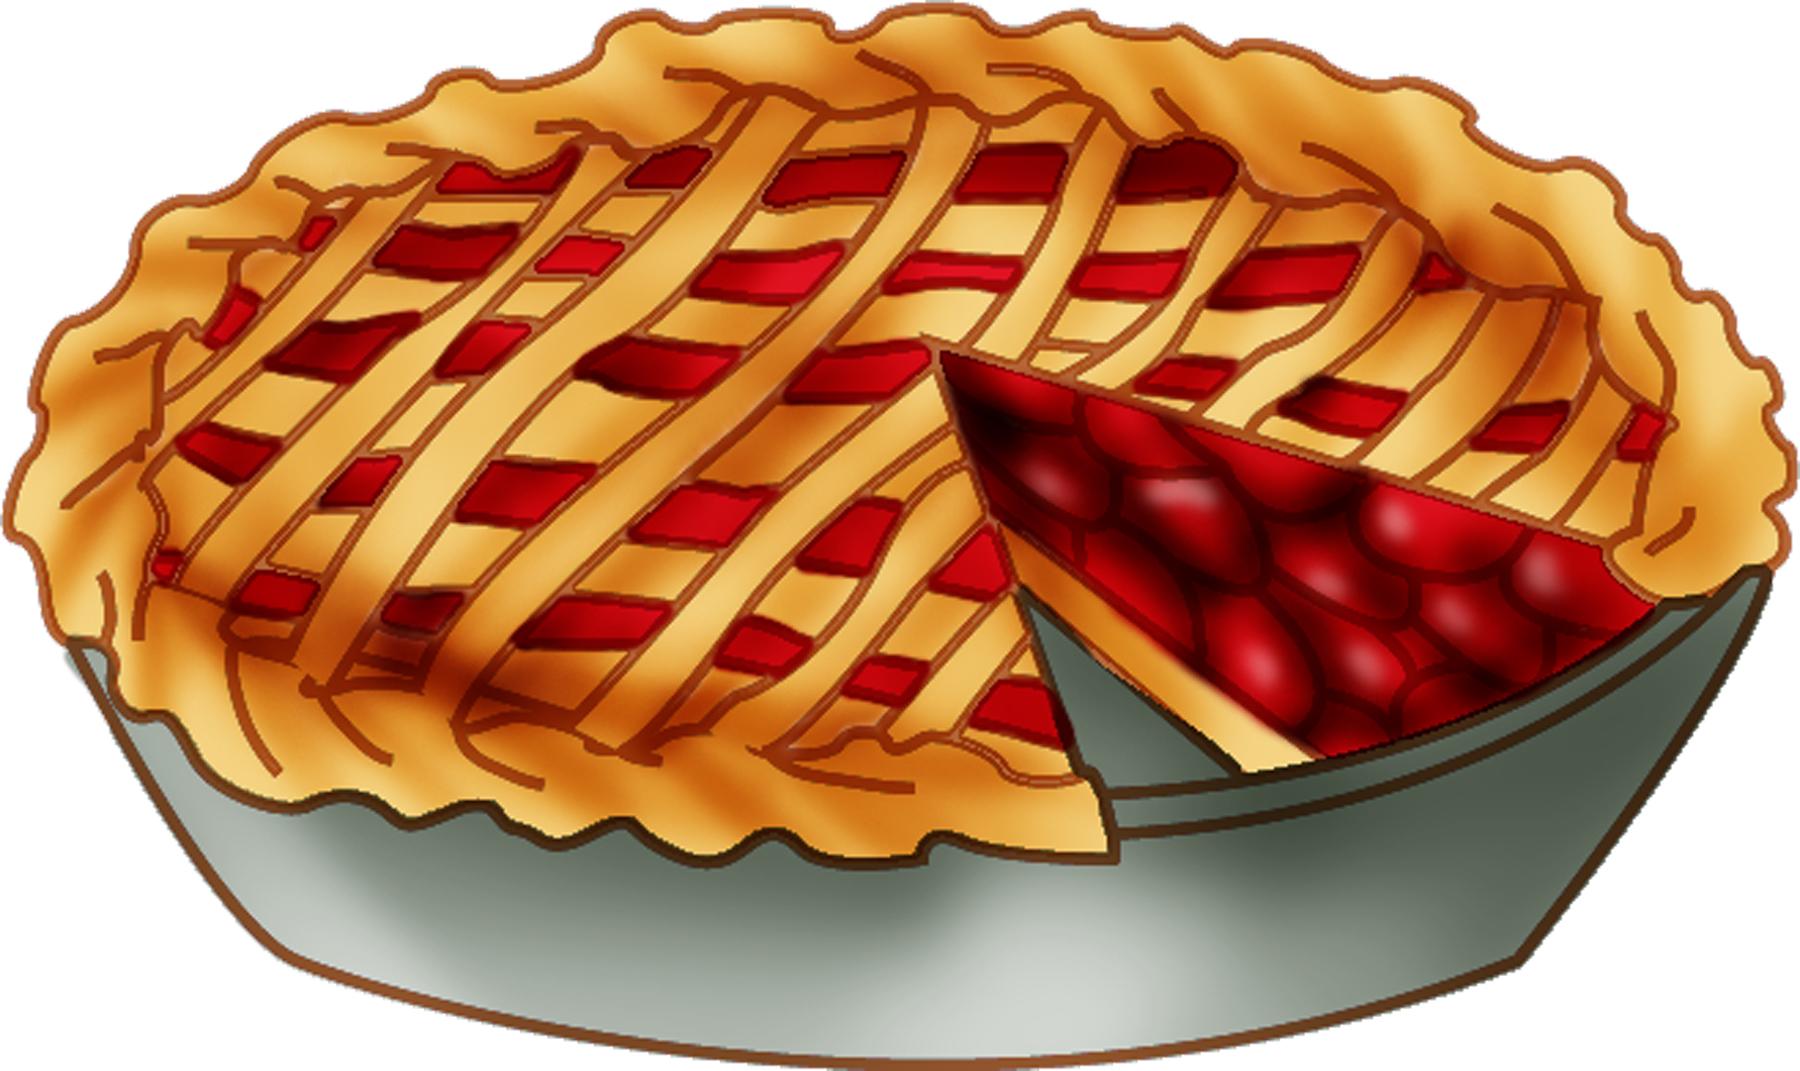 Cherry Pie Day Clipart - Clipart Kid